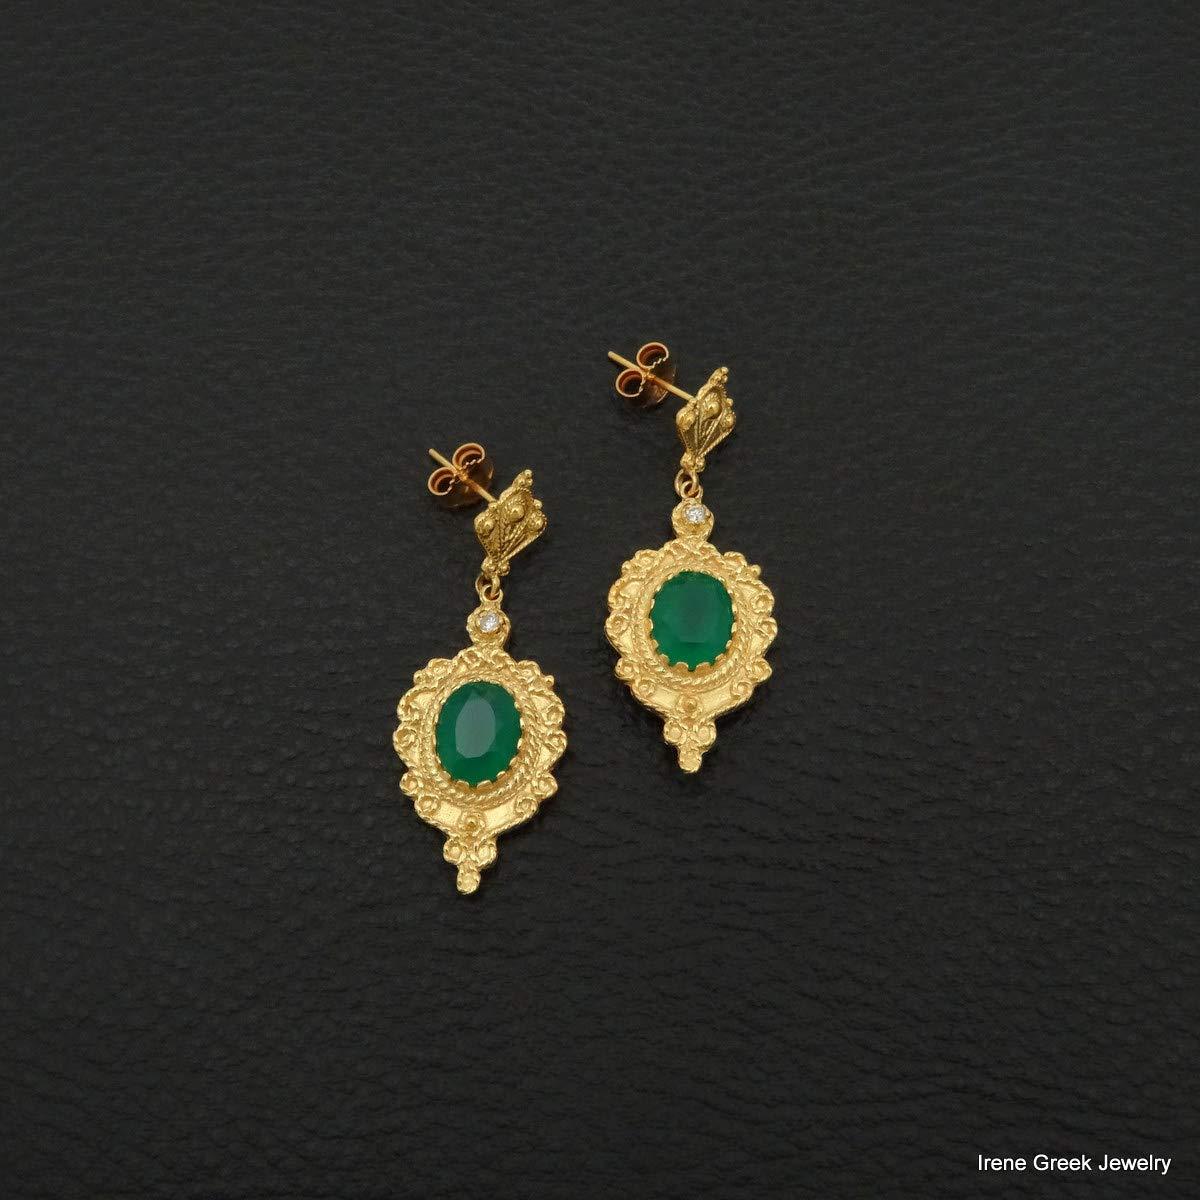 Natural Green Onyx Earrings Byzantine Style 925 Sterling Silver 22K Gold Plated Greek Handmade Art Luxury